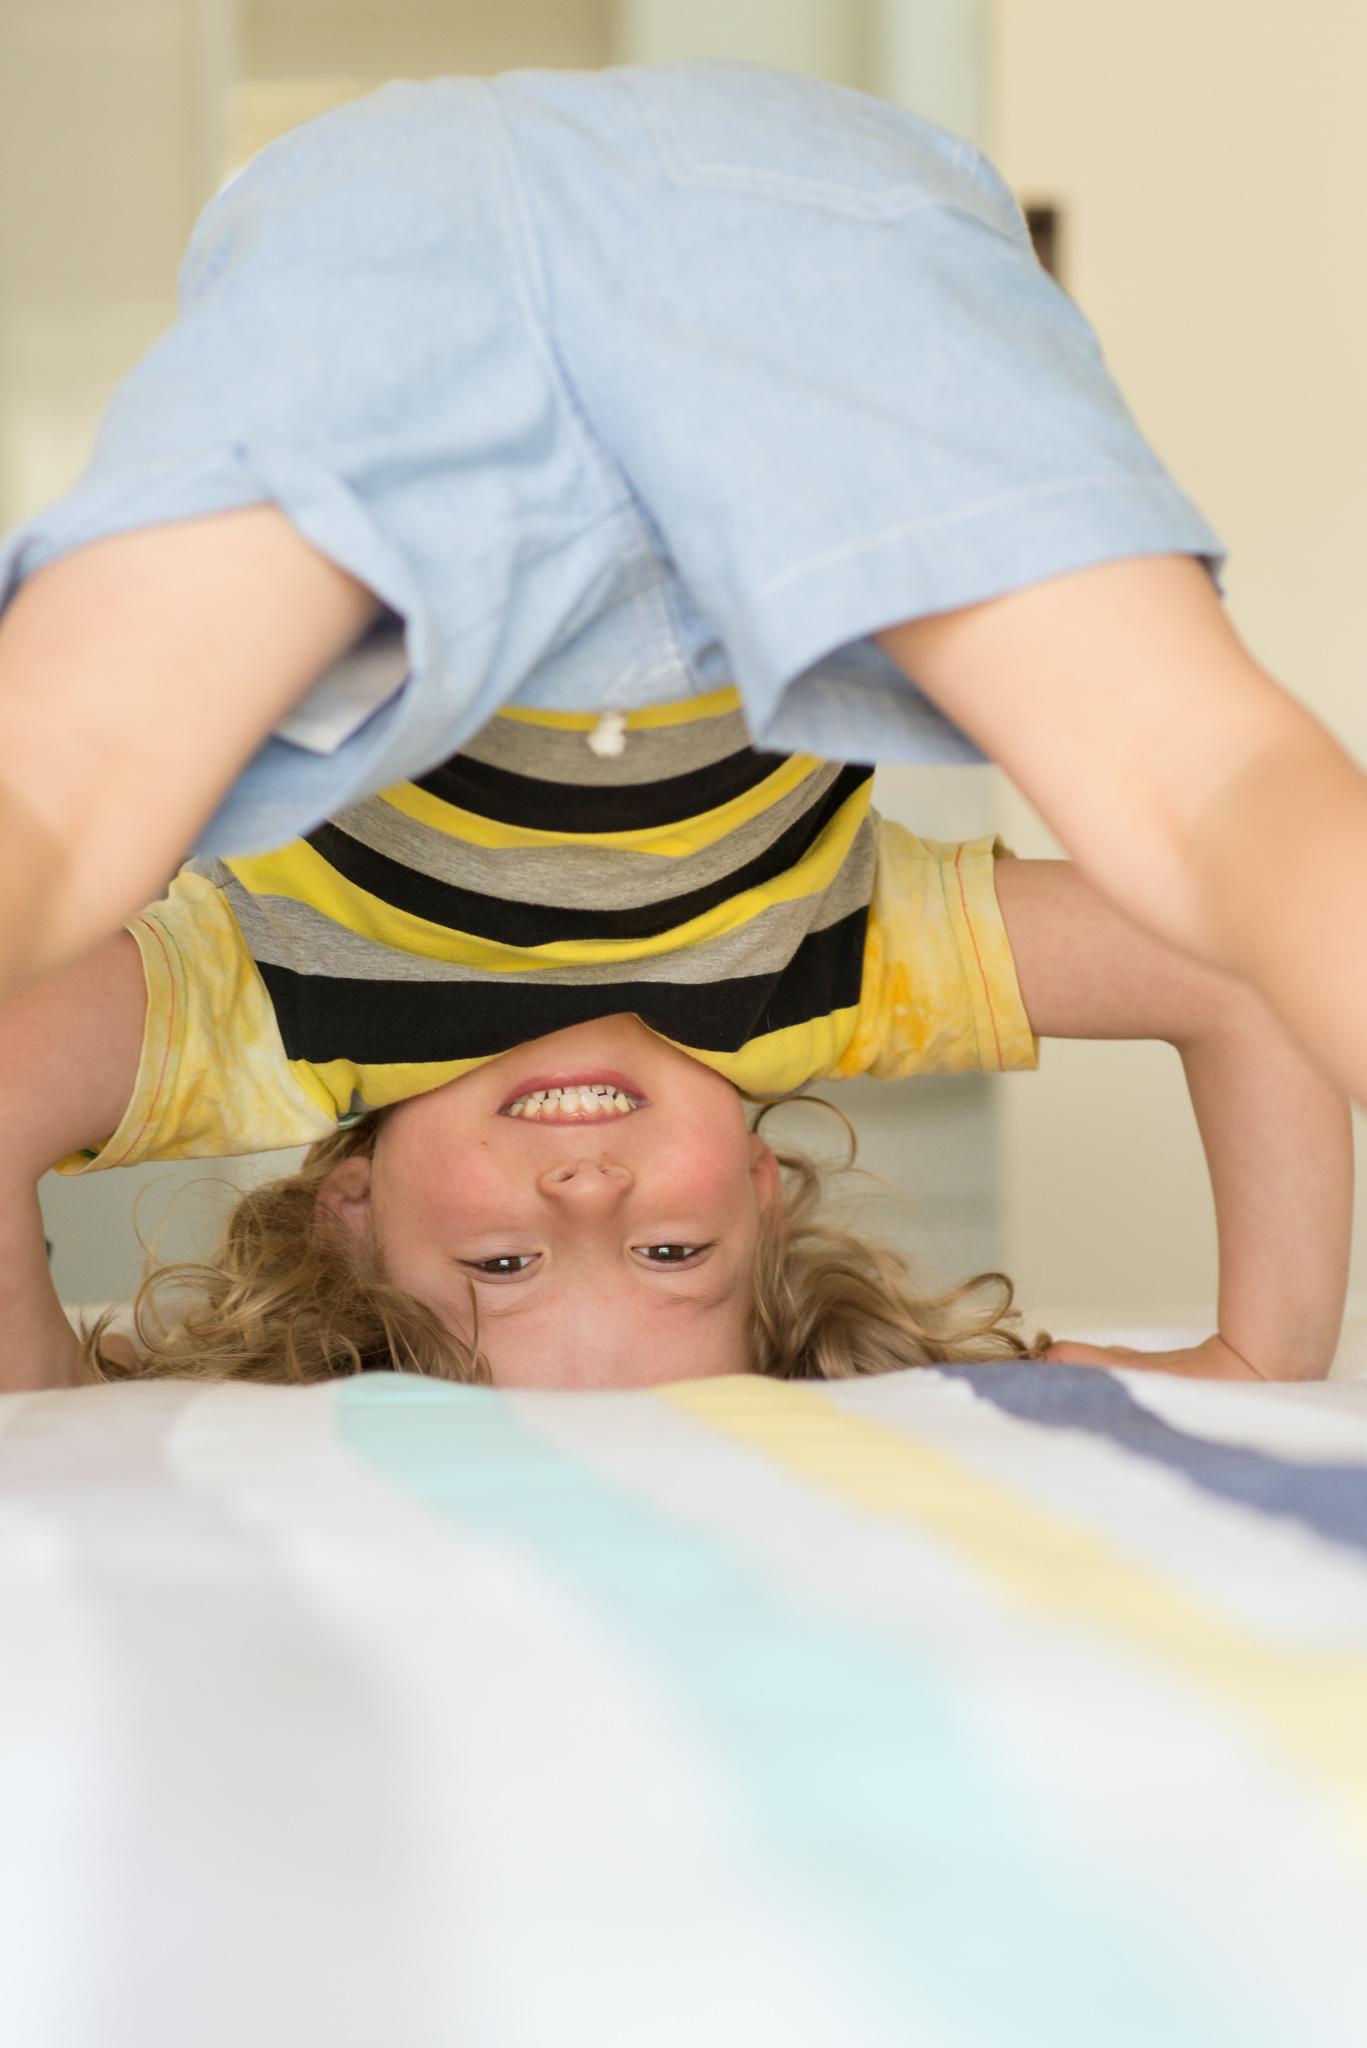 Upside down Mr 3